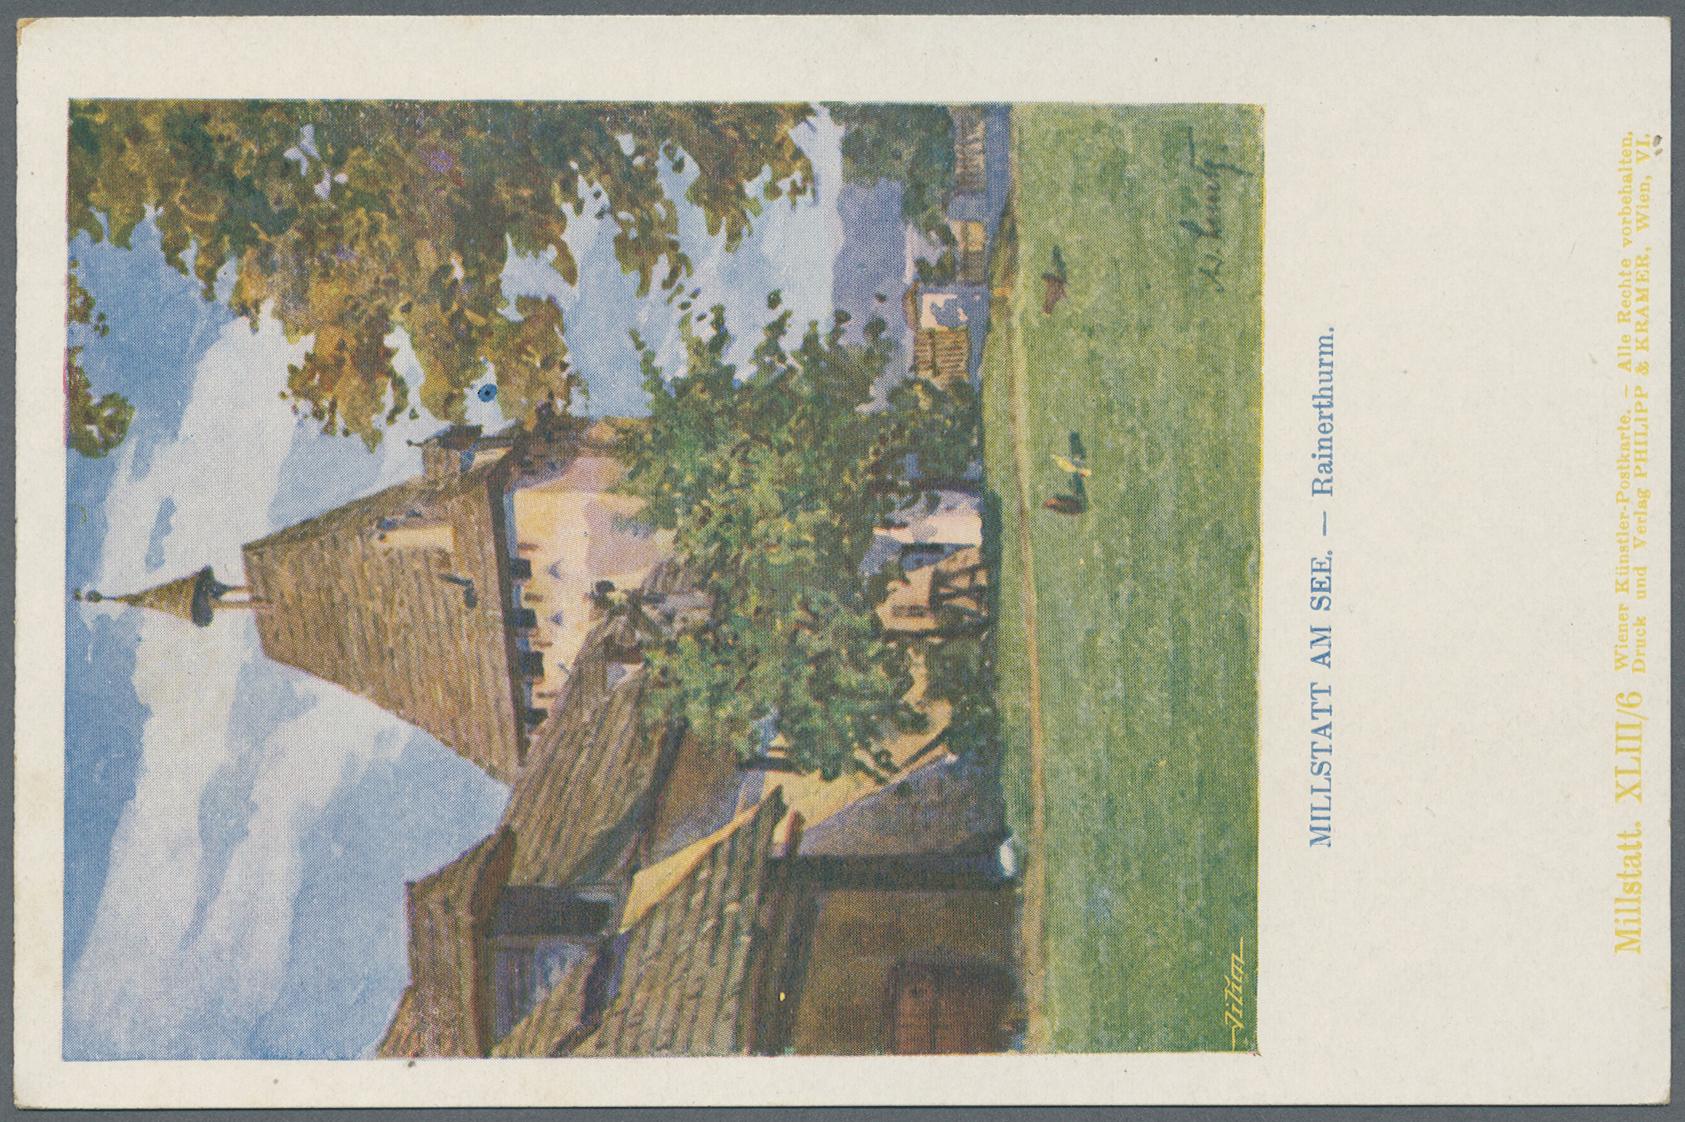 Lot 04134 - Ansichtskarten: Österreich  -  Auktionshaus Christoph Gärtner GmbH & Co. KG Sale #48 The Coins & The Picture Post Cards